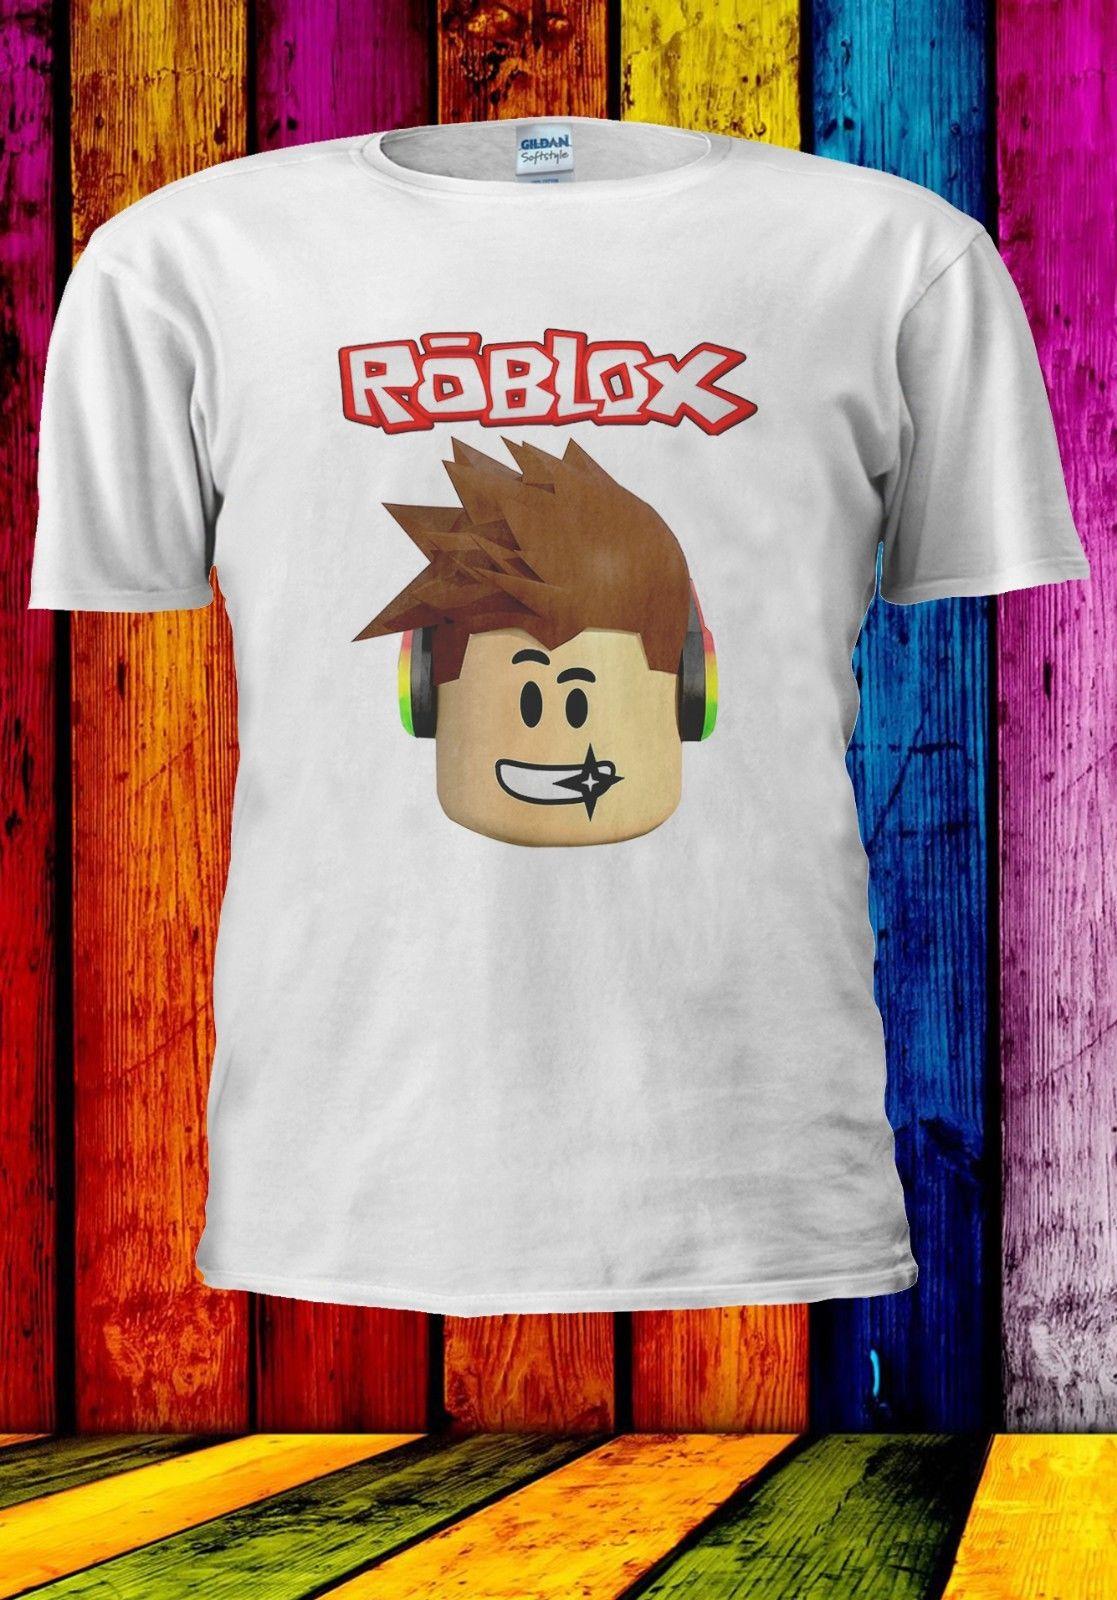 How Do U Make Your Own T Shirt In Roblox لم يسبق له مثيل الصور